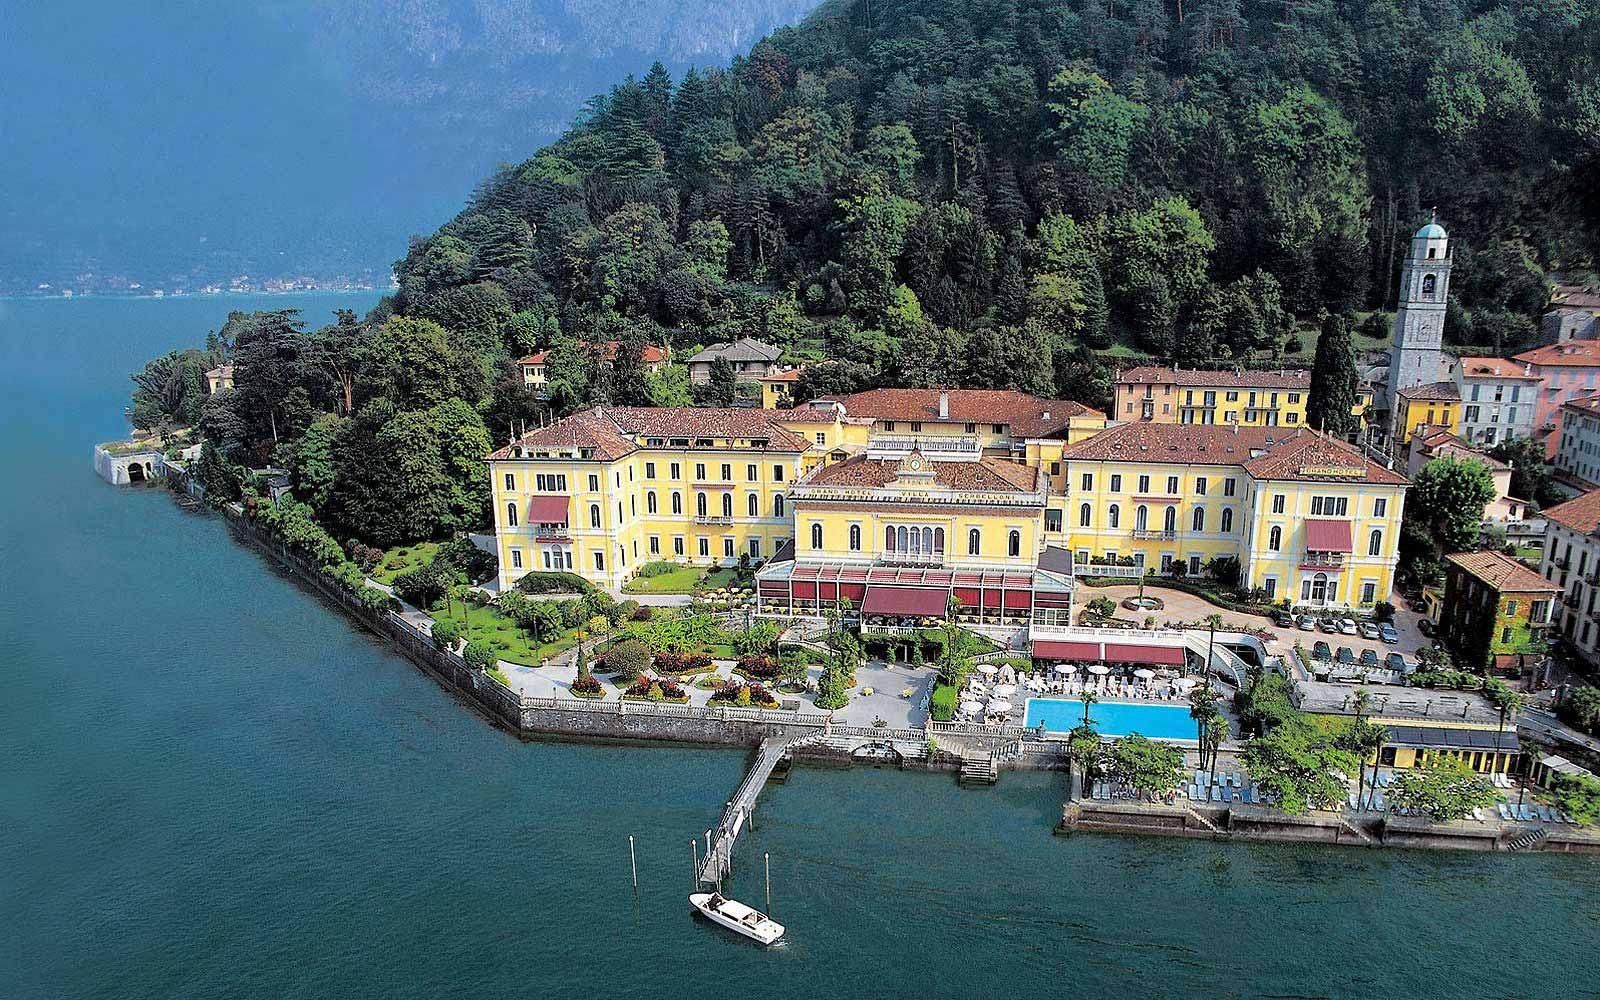 Panoramic view of Grand Hotel Villa Serbelloni